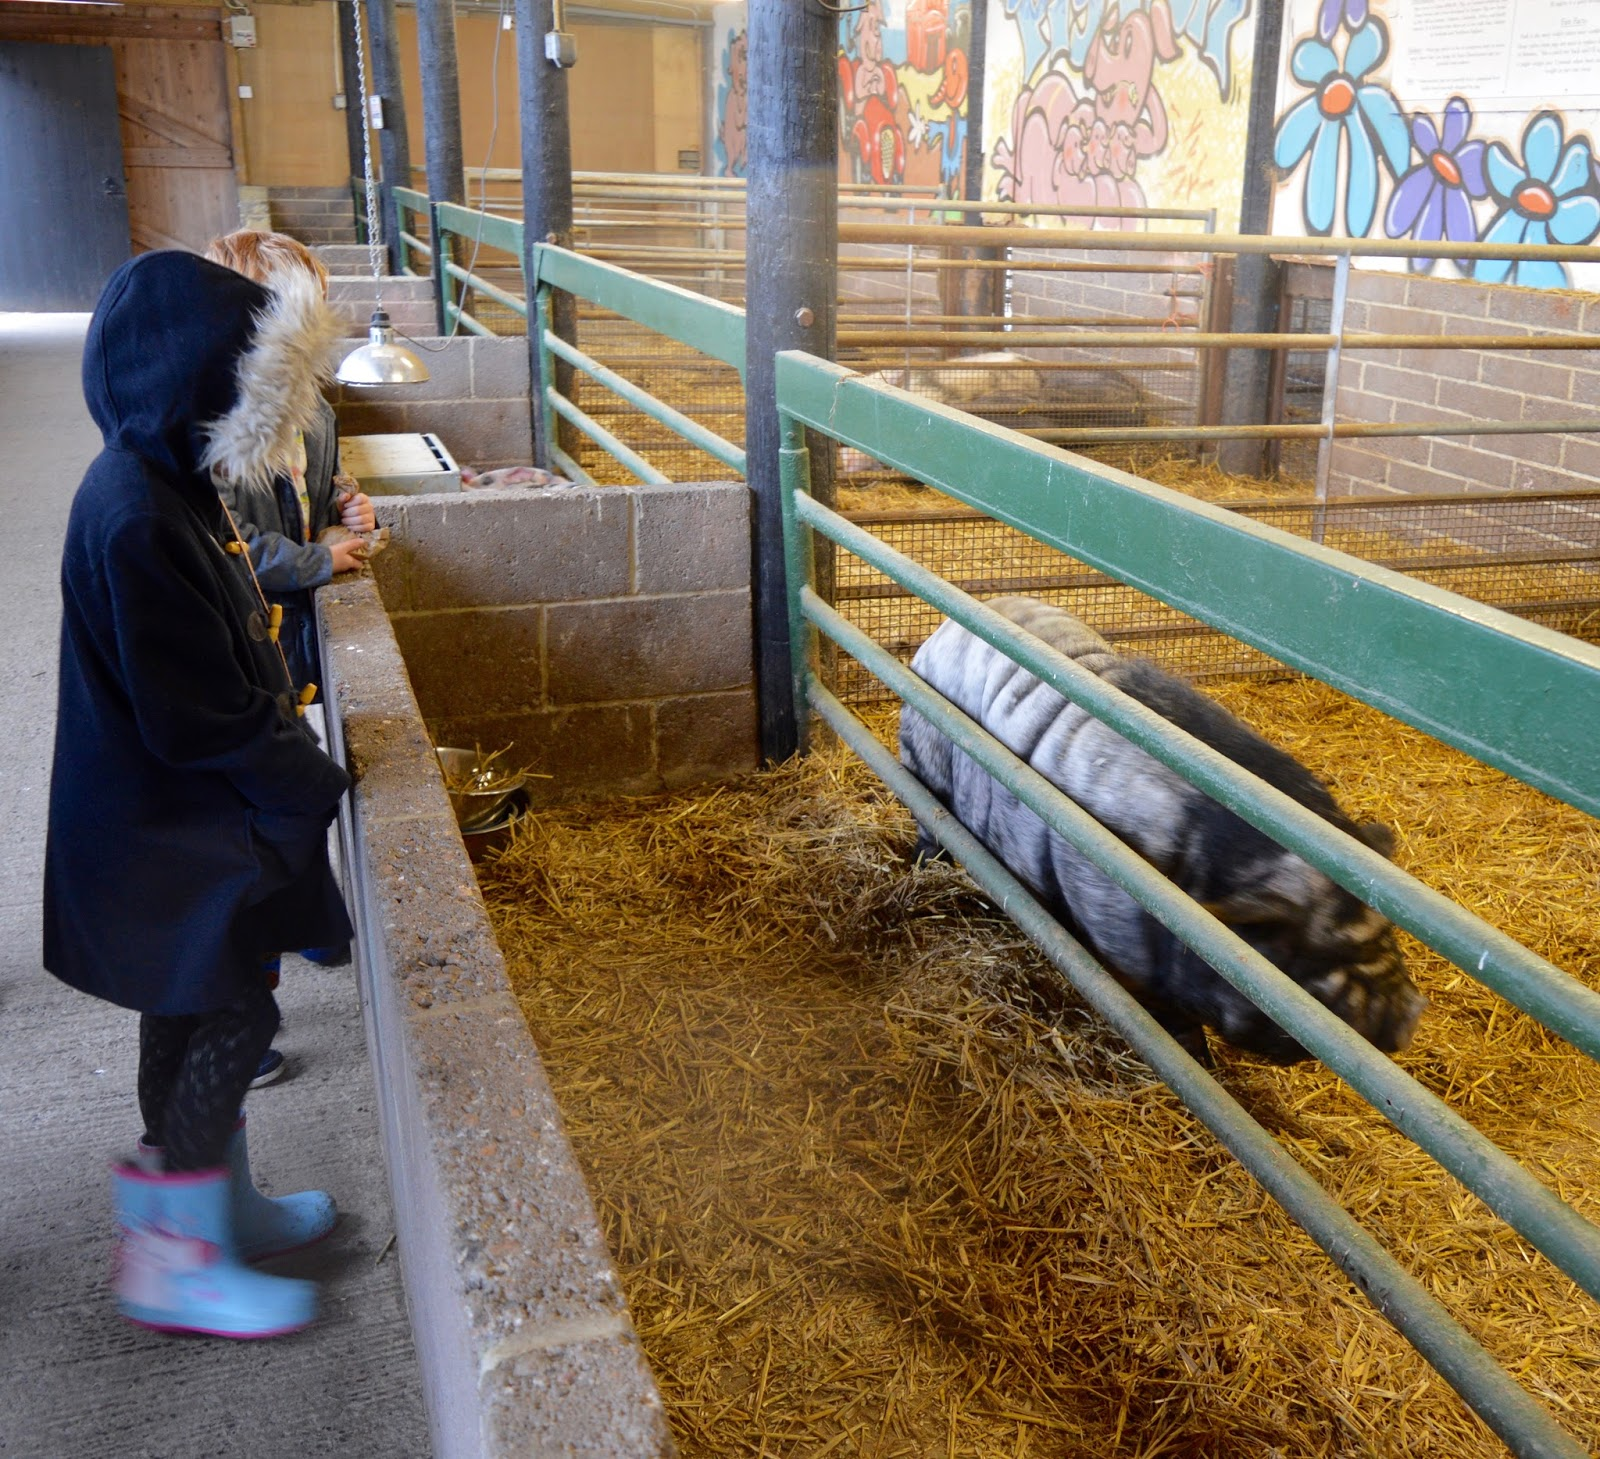 Whitehouse Farm Morpeth | What to do when it rains | North ...